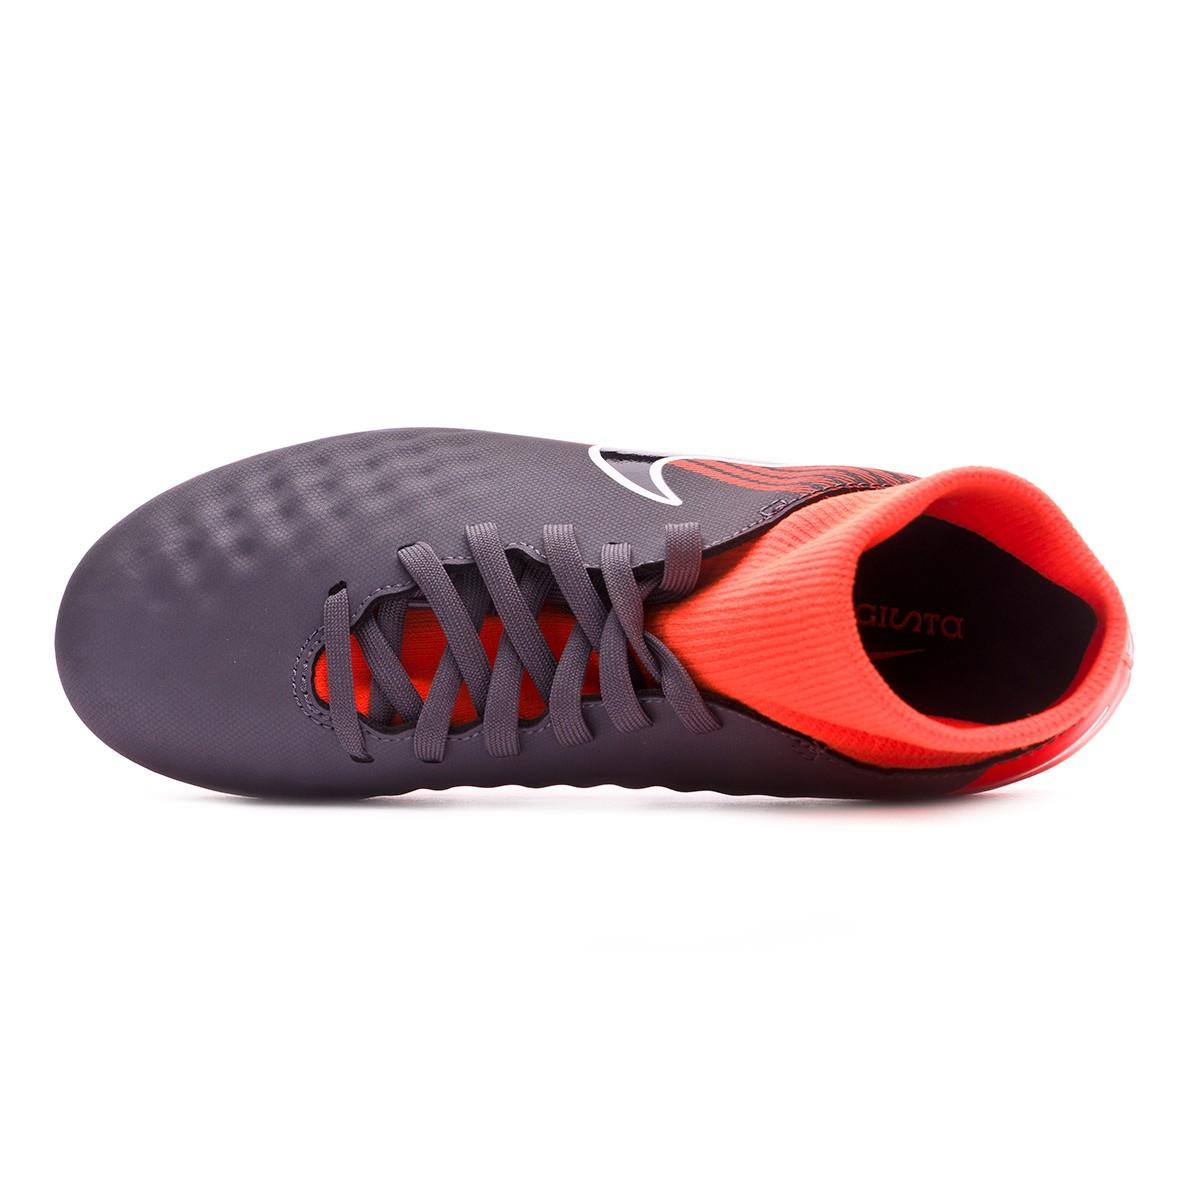 d3ff284c398 Football Boots Nike Kids Magista Obra II Academy DF FG Dark grey-Black-Total  orange-White - Tienda de fútbol Fútbol Emotion